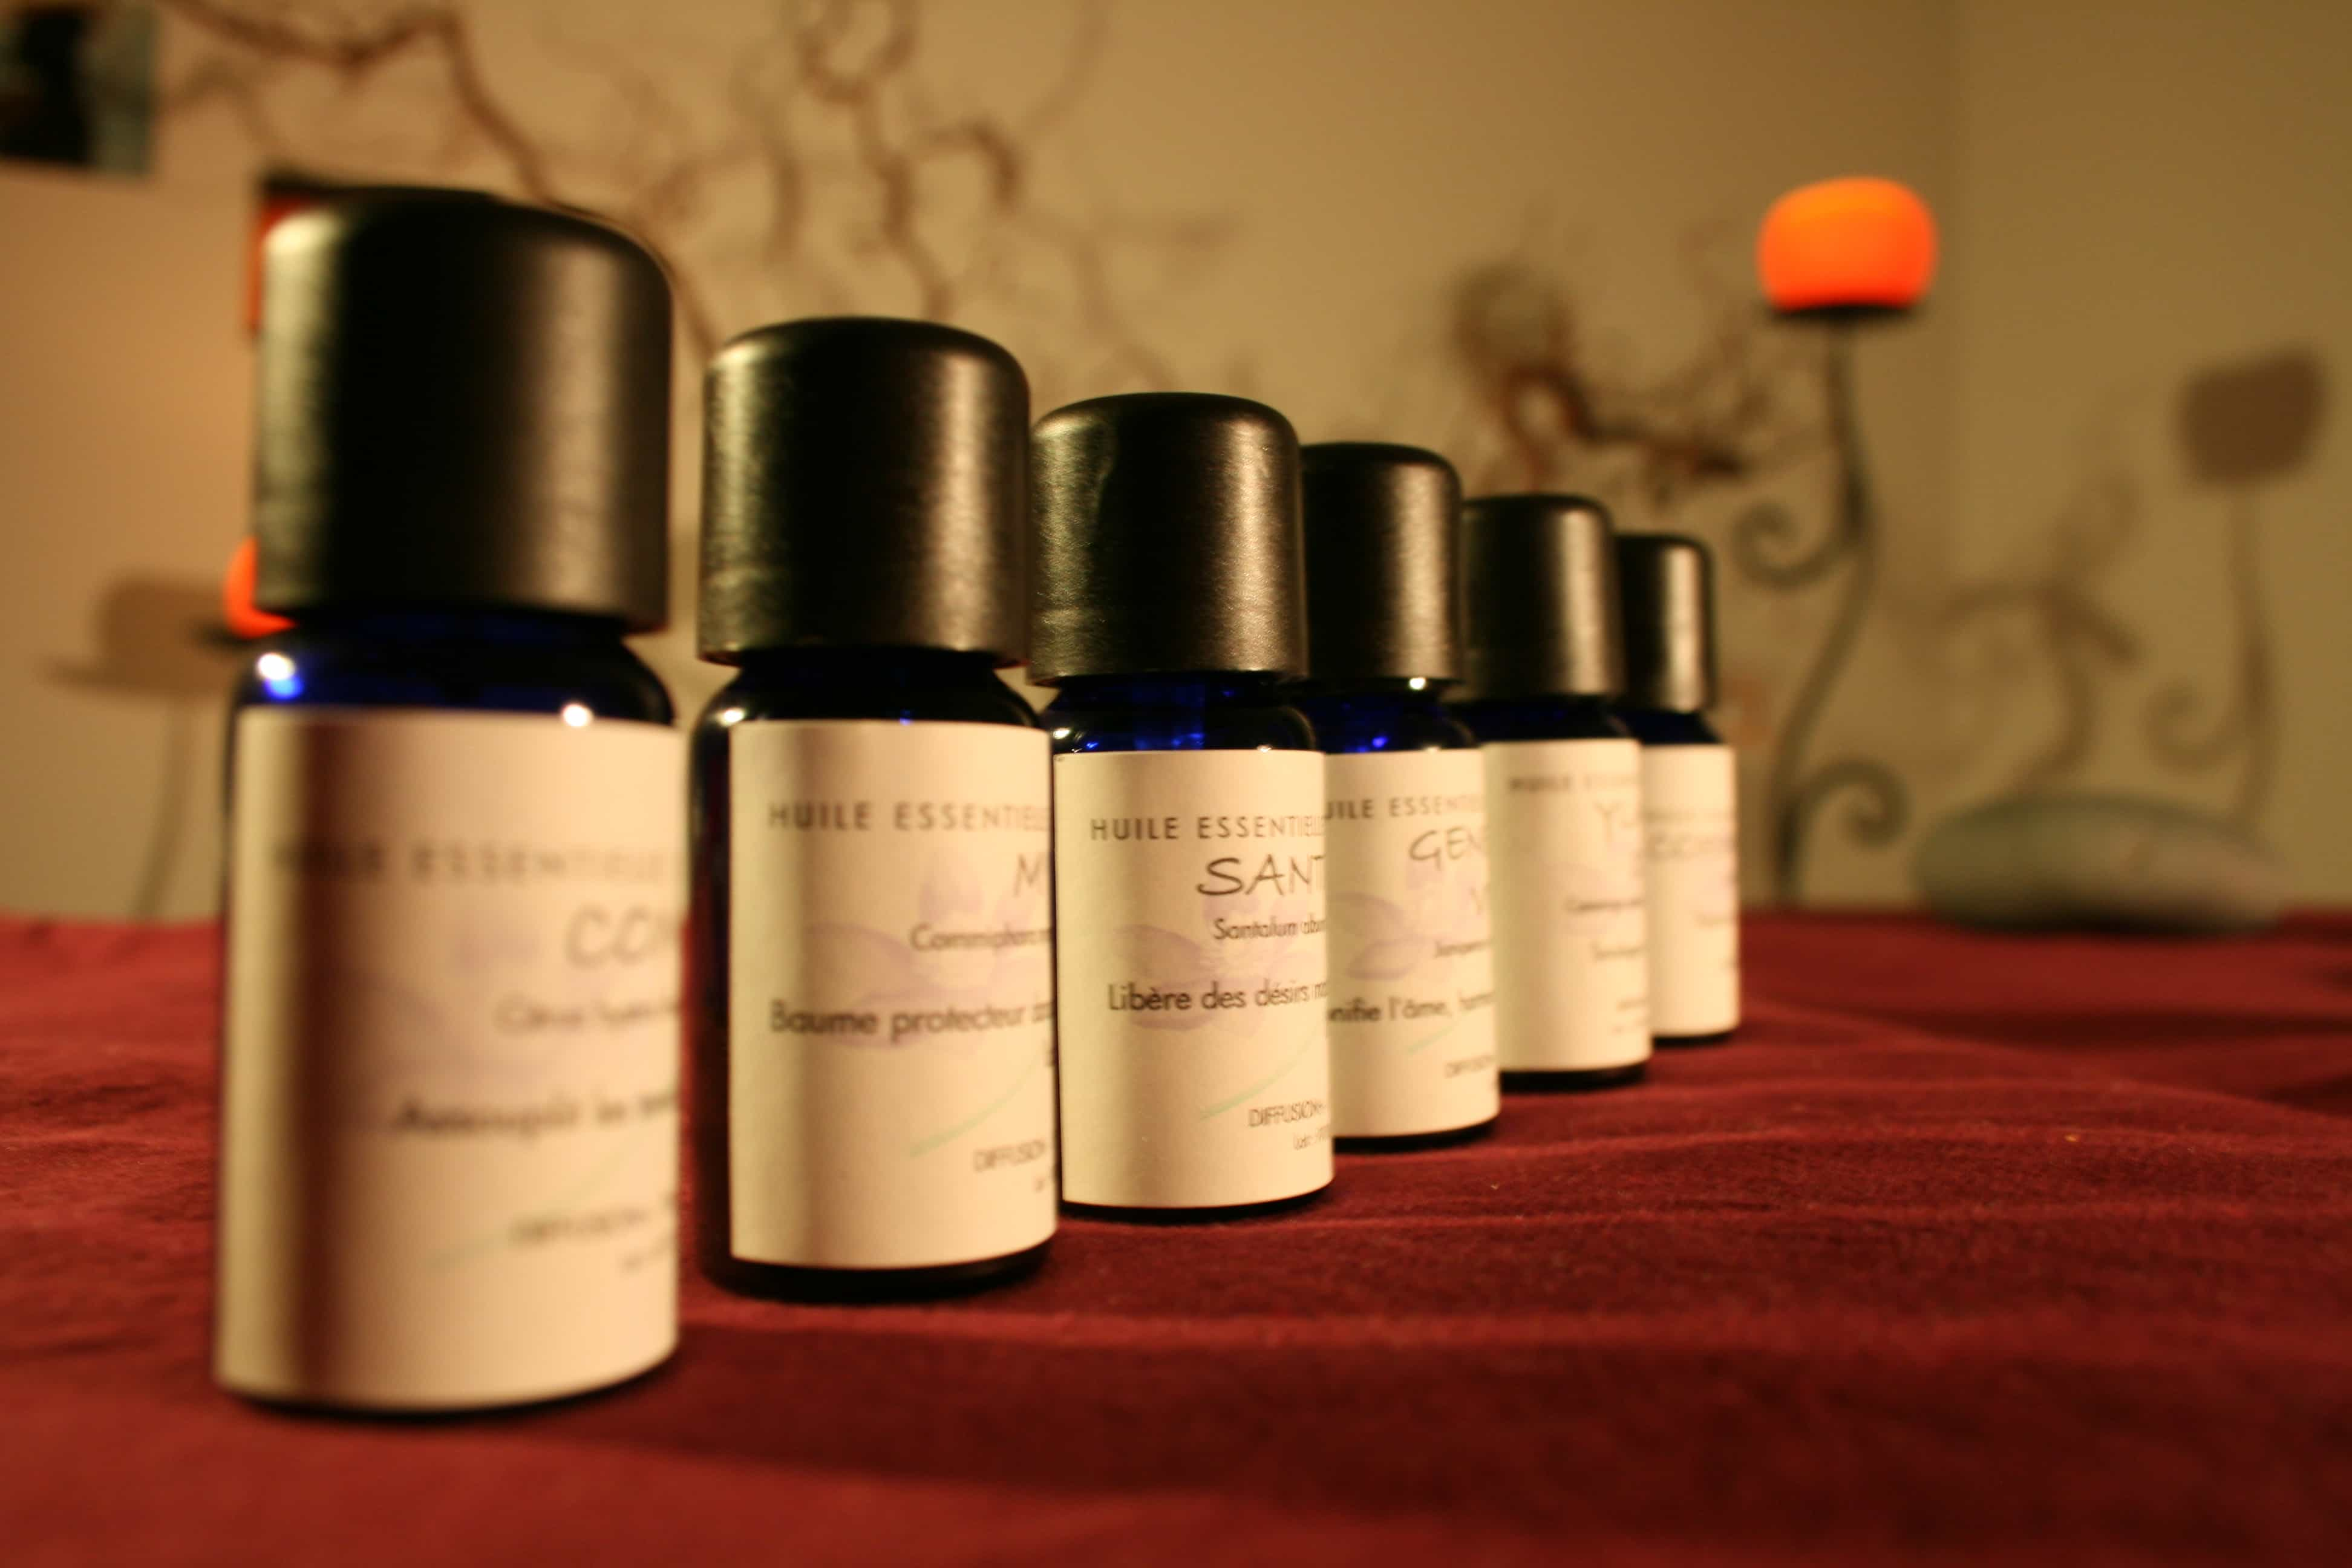 Une huile essentielle «Essentielle»!